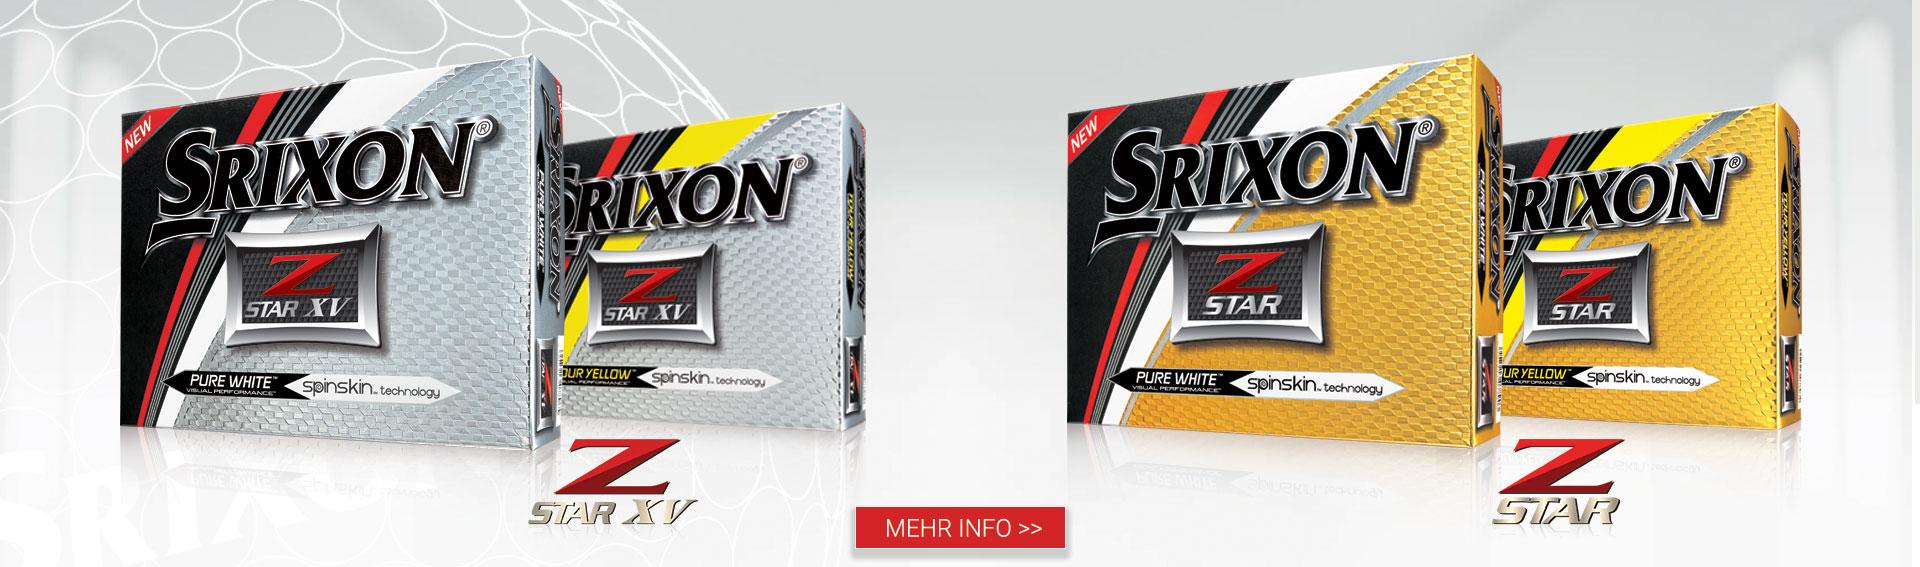 Srixon Z Star and Z Star XZ Golf Balls